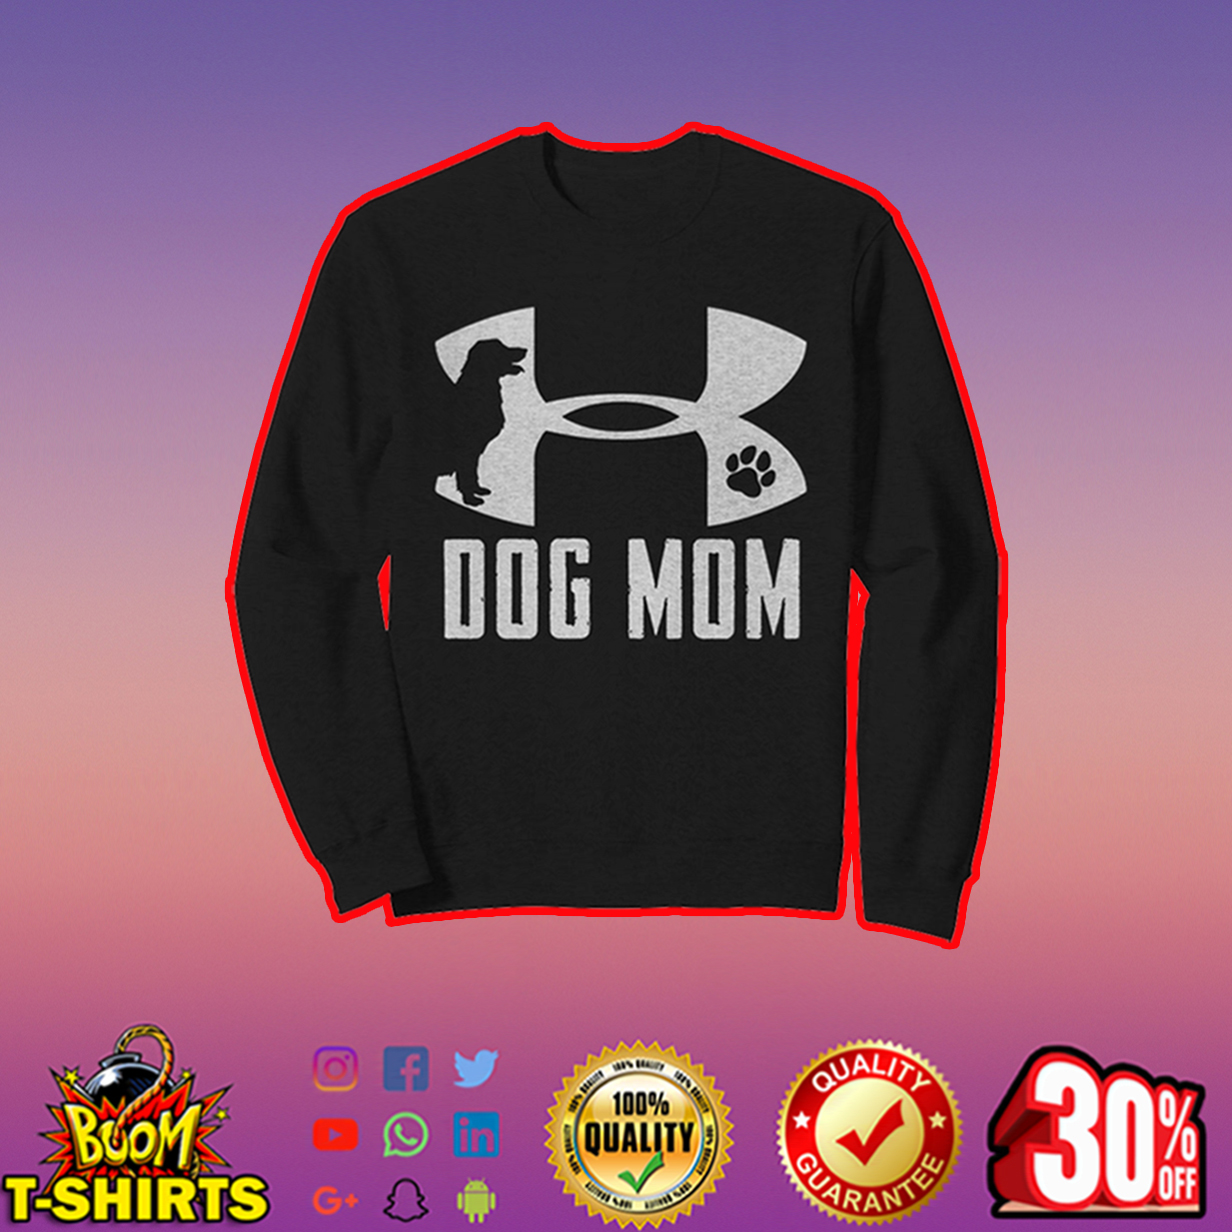 Under Armour Dog Mom sweatshirt